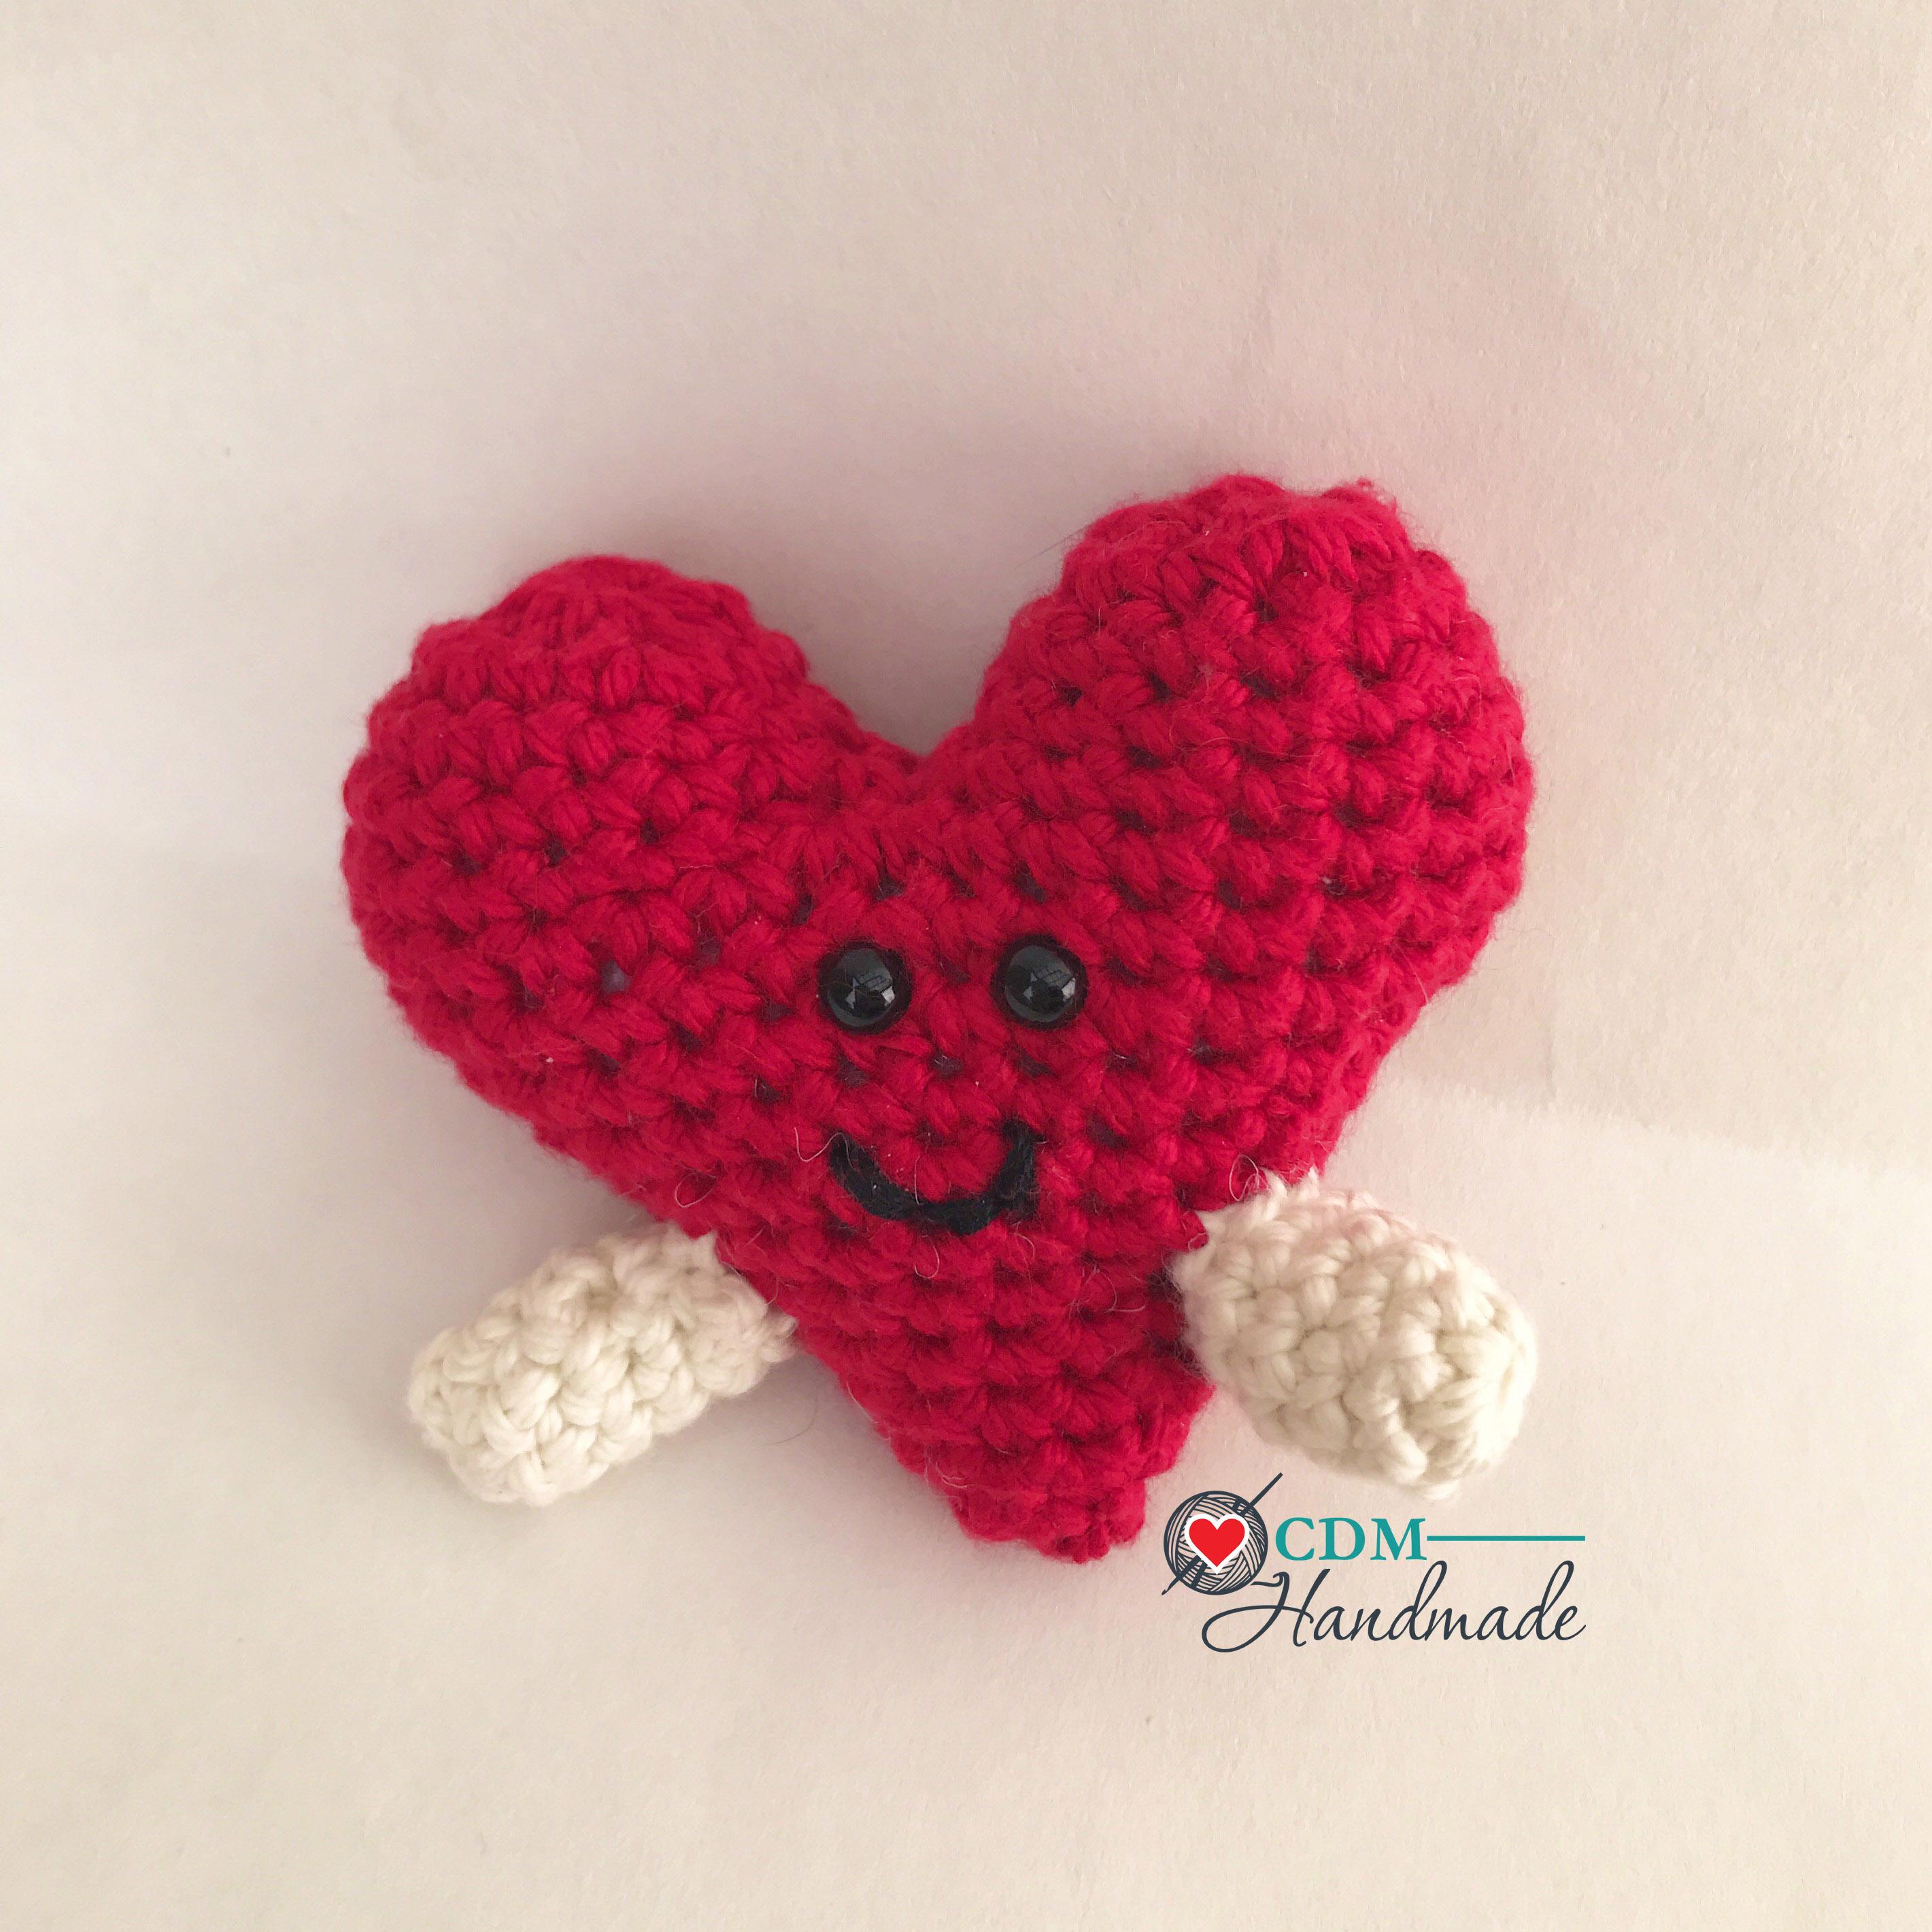 Heart Full Of Love A Valentines Day Free Crochet Pattern Cdm